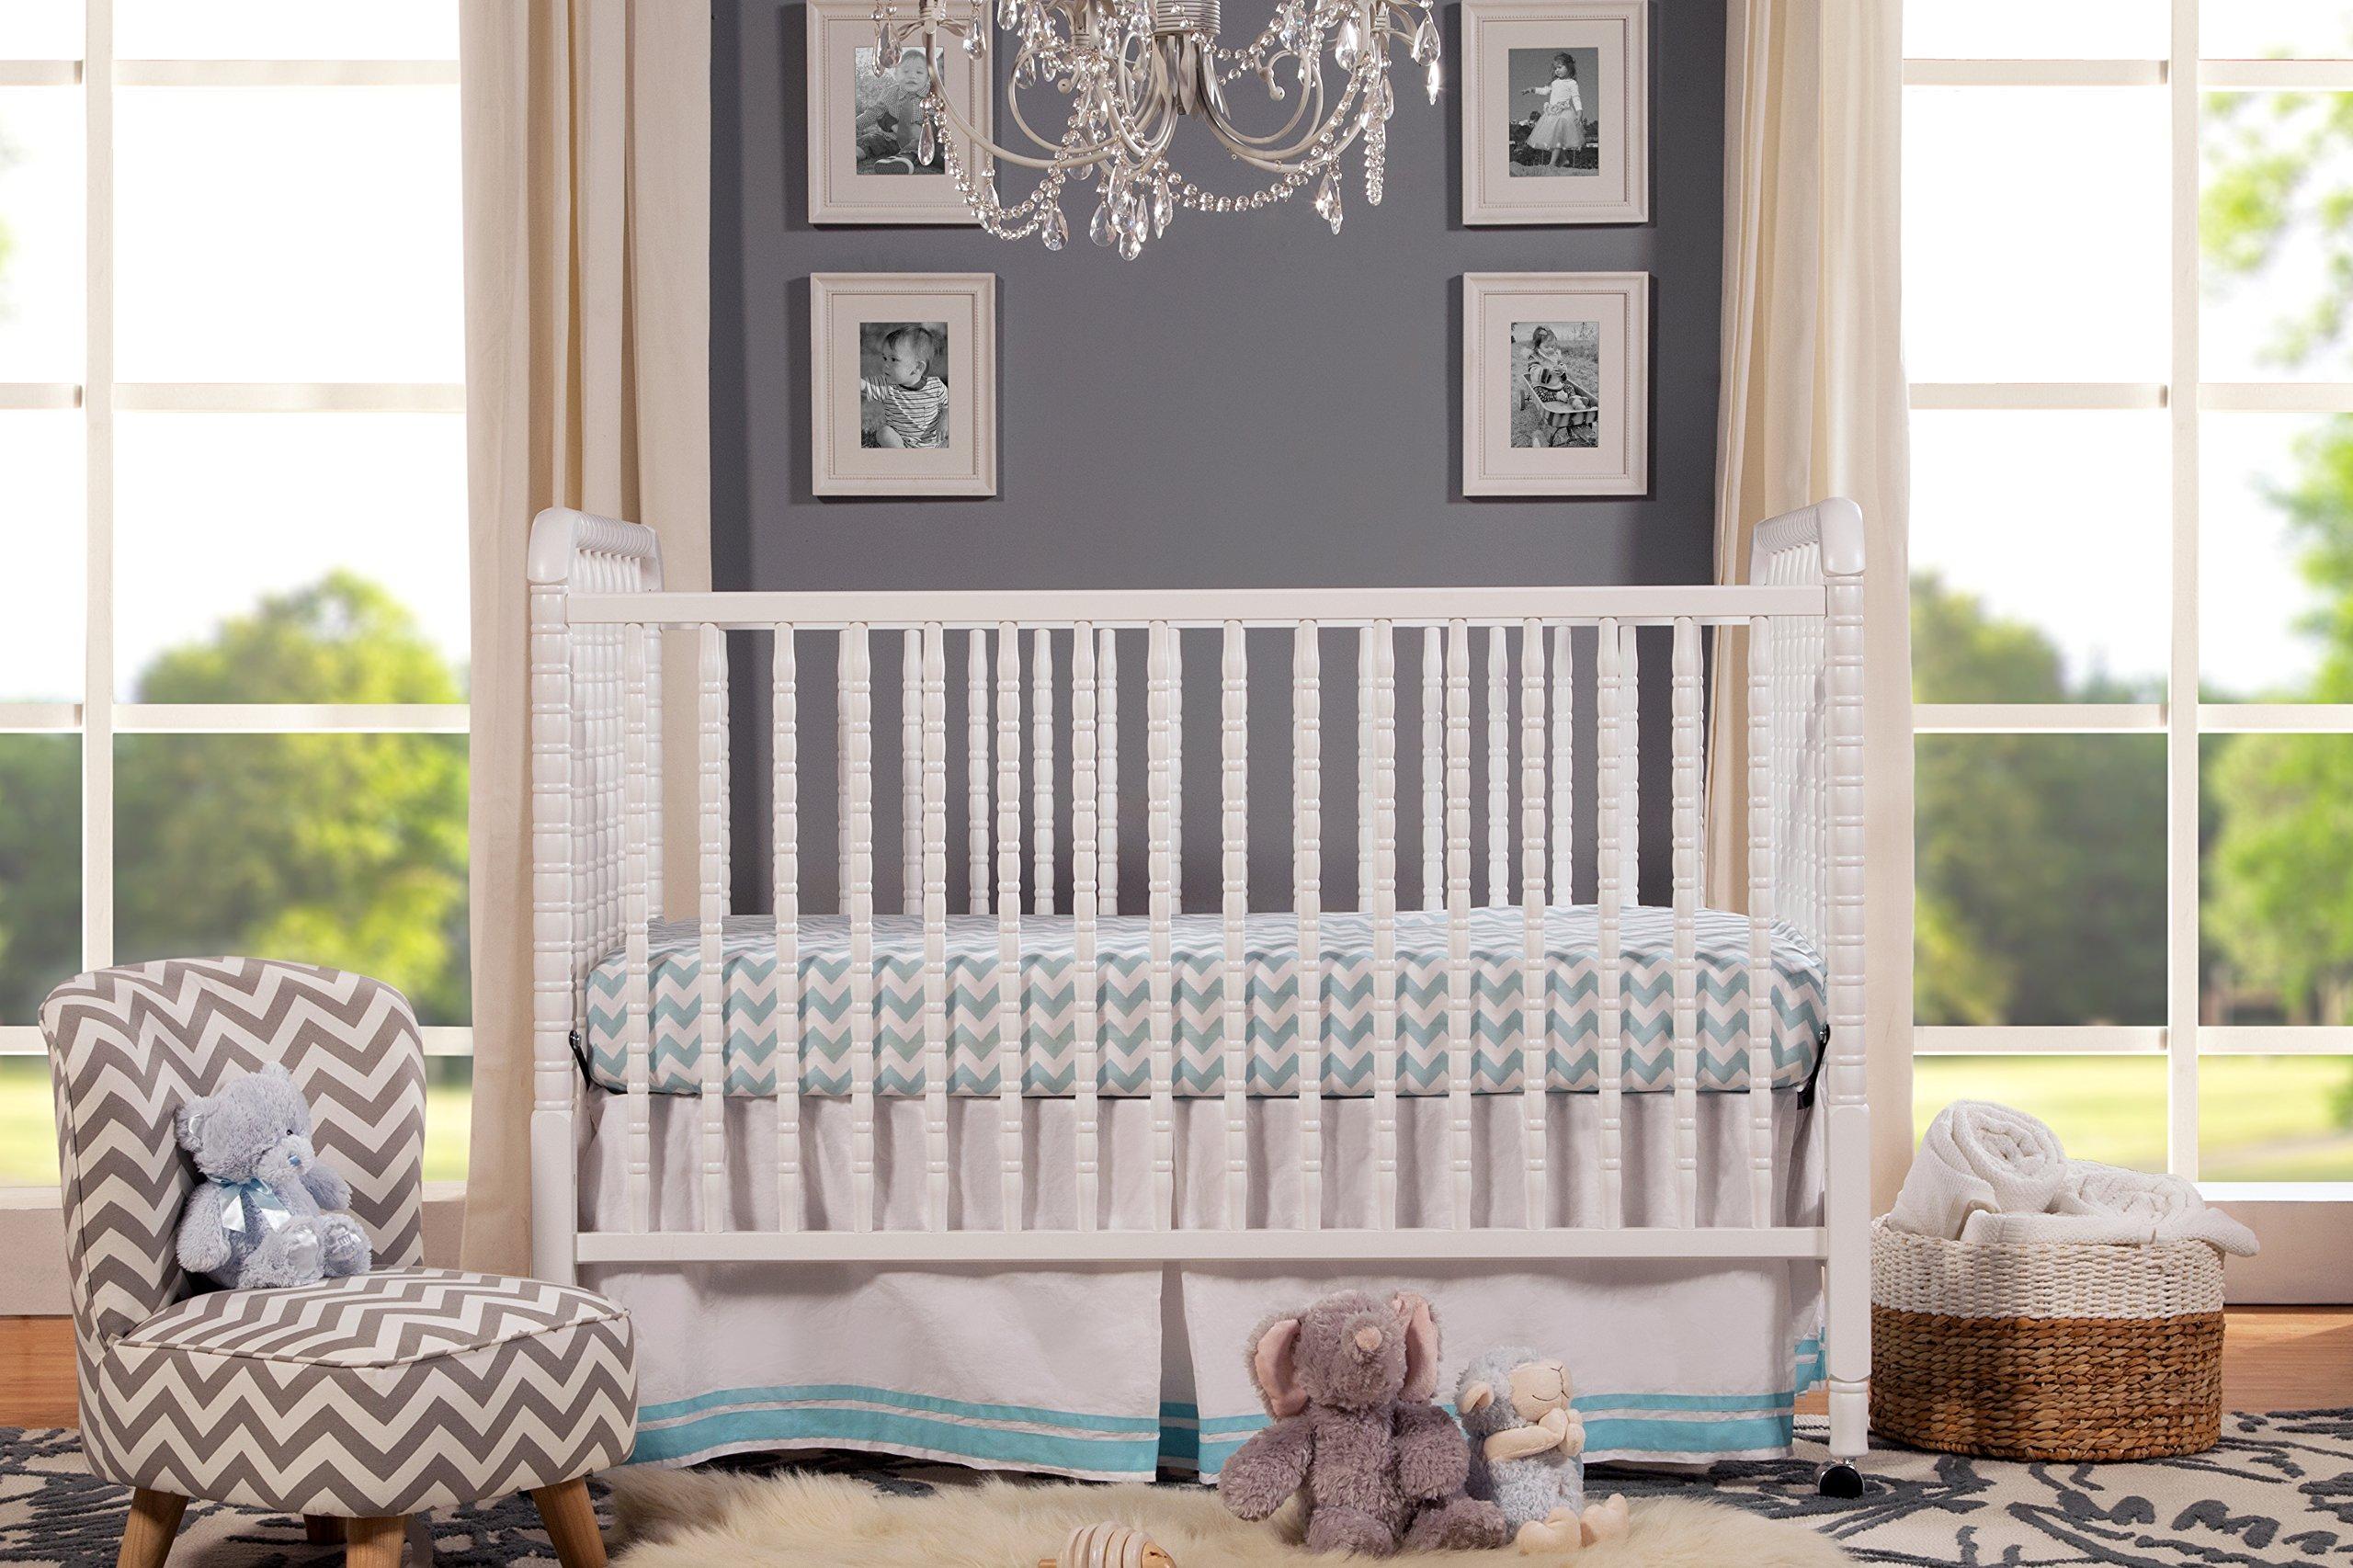 DaVinci Jenny Lind Stationary Crib, White by DaVinci (Image #3)